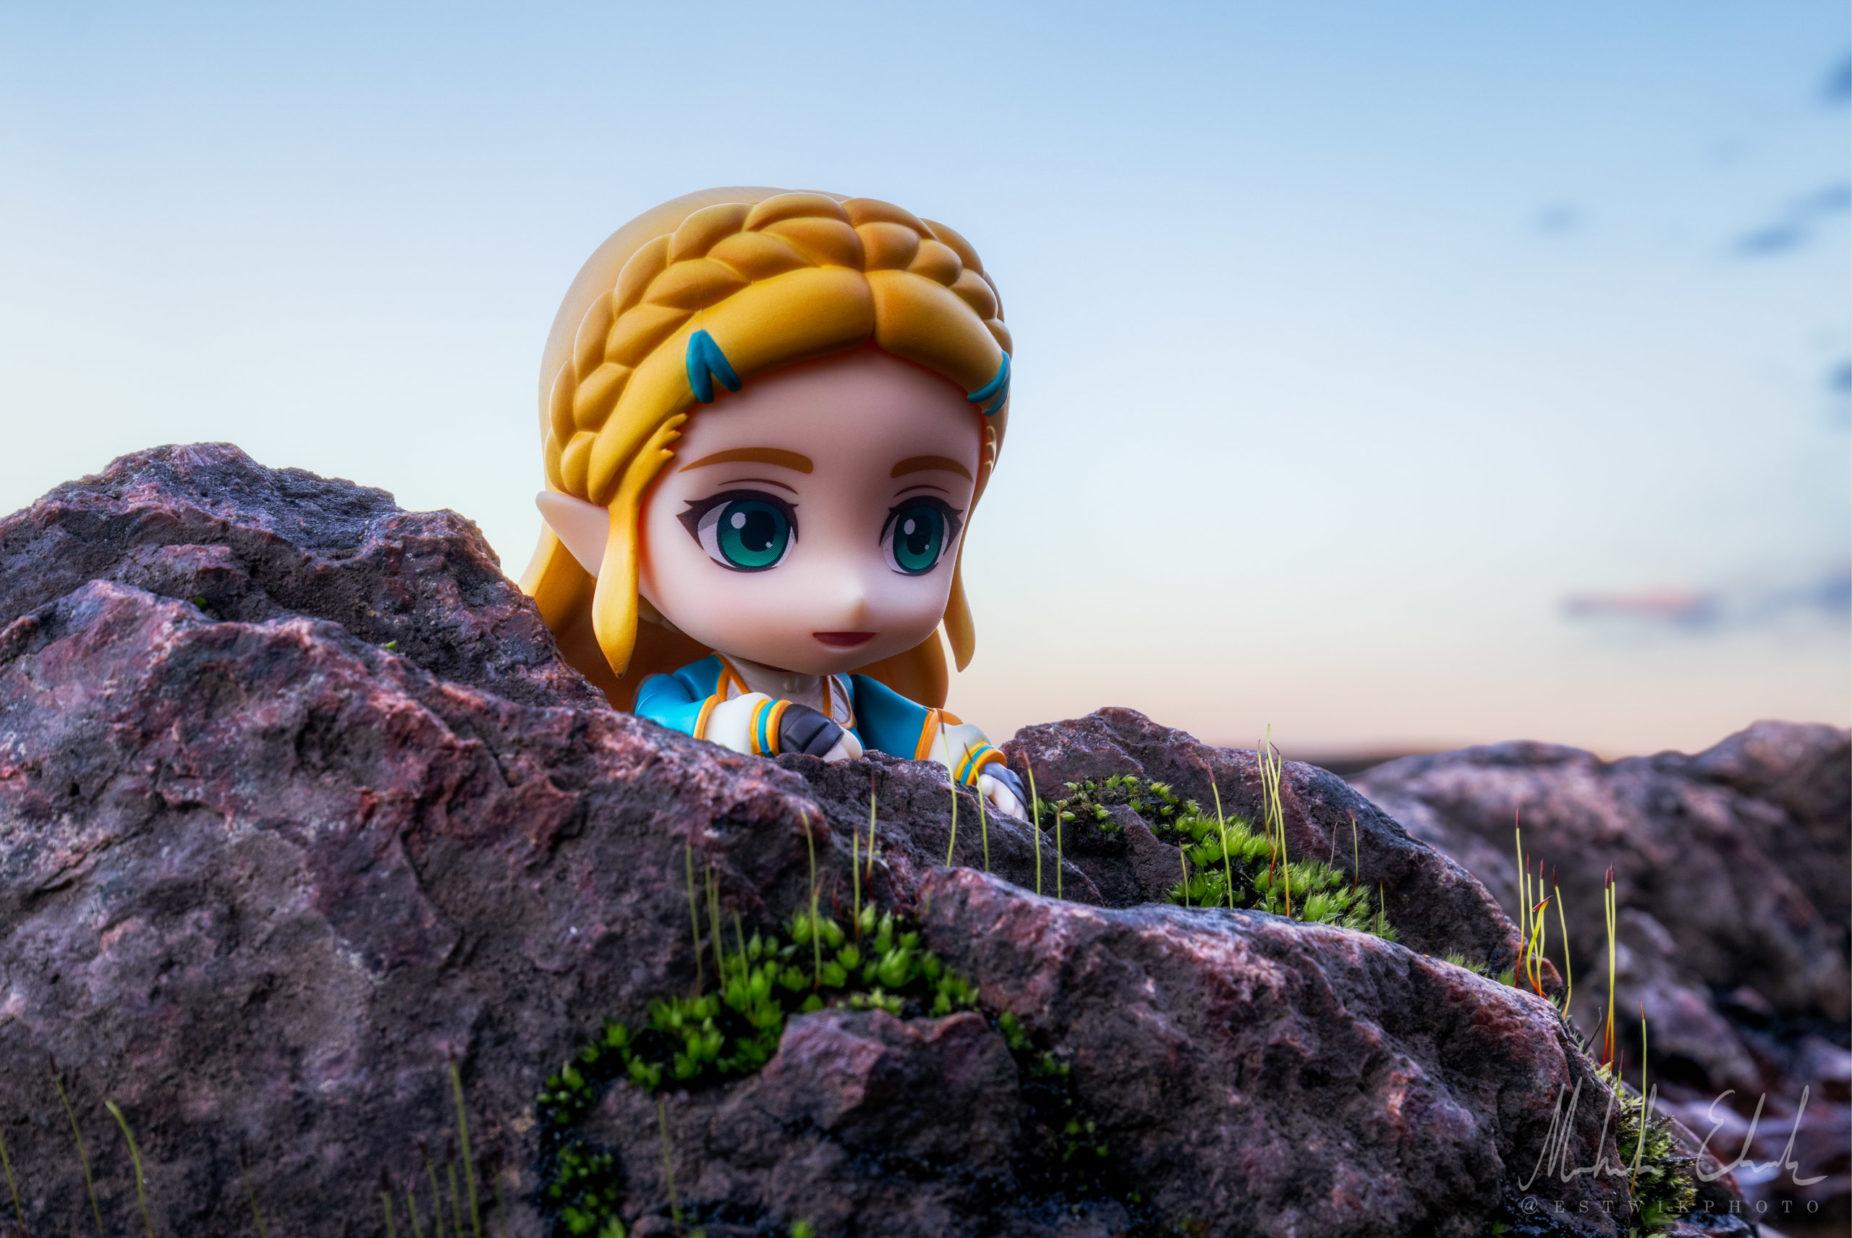 Zelda bestiger en en klippa